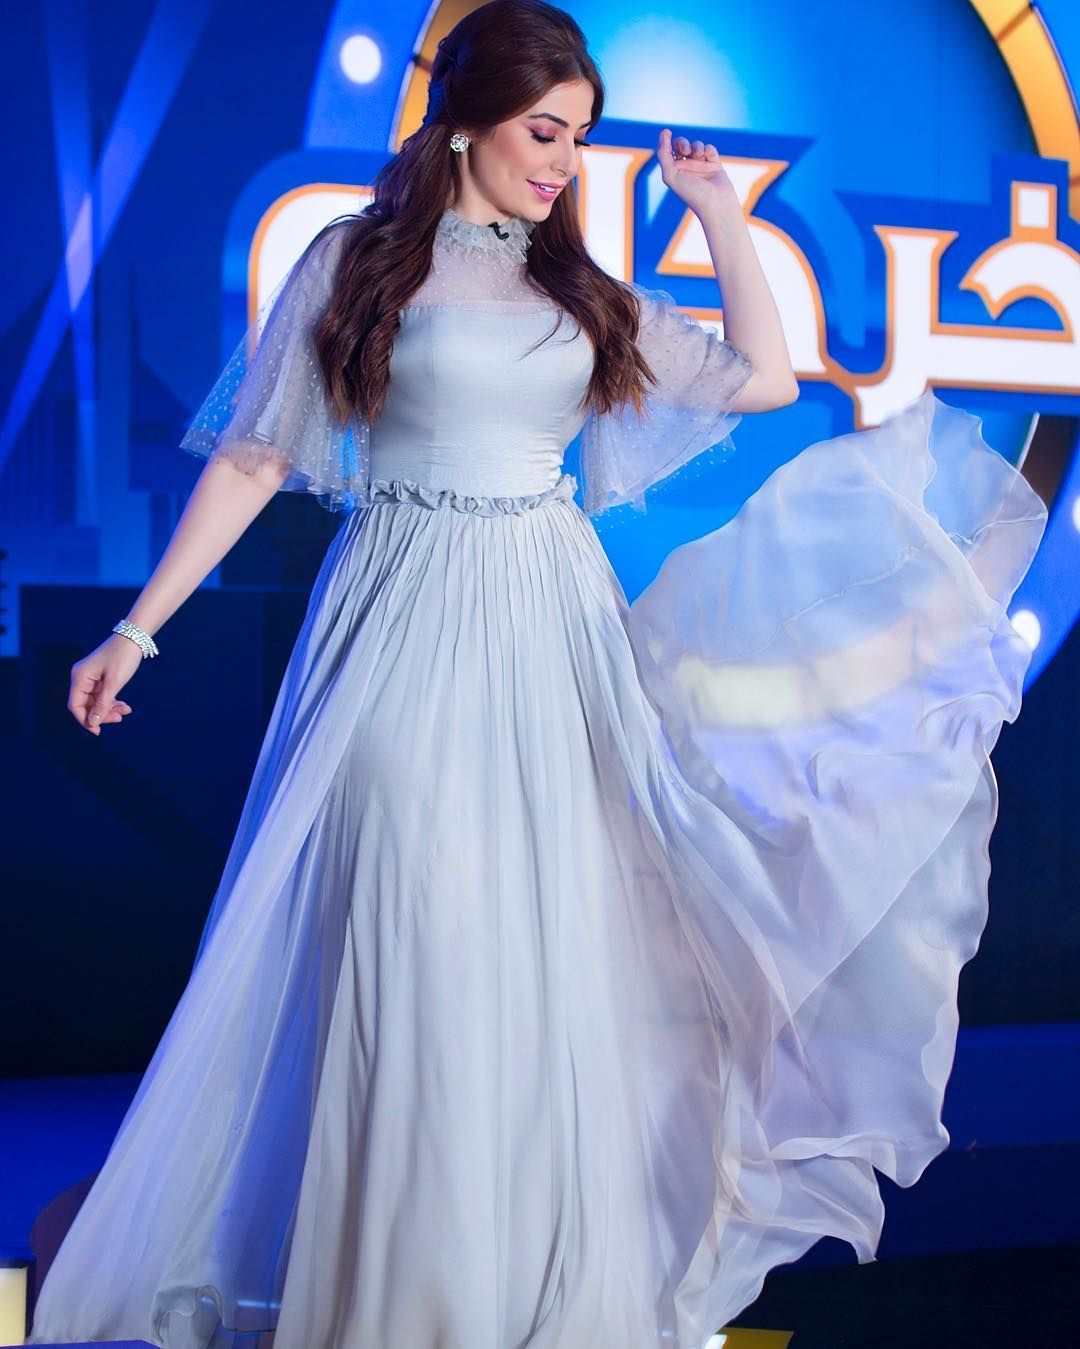 18 1 K Mentions J Aime 1 649 Commentaires Roaa رؤى الصبان Alsabban Roaa Alsabban Sur Instagram قفطان Almka Dresses Formal Dresses Long Formal Dresses